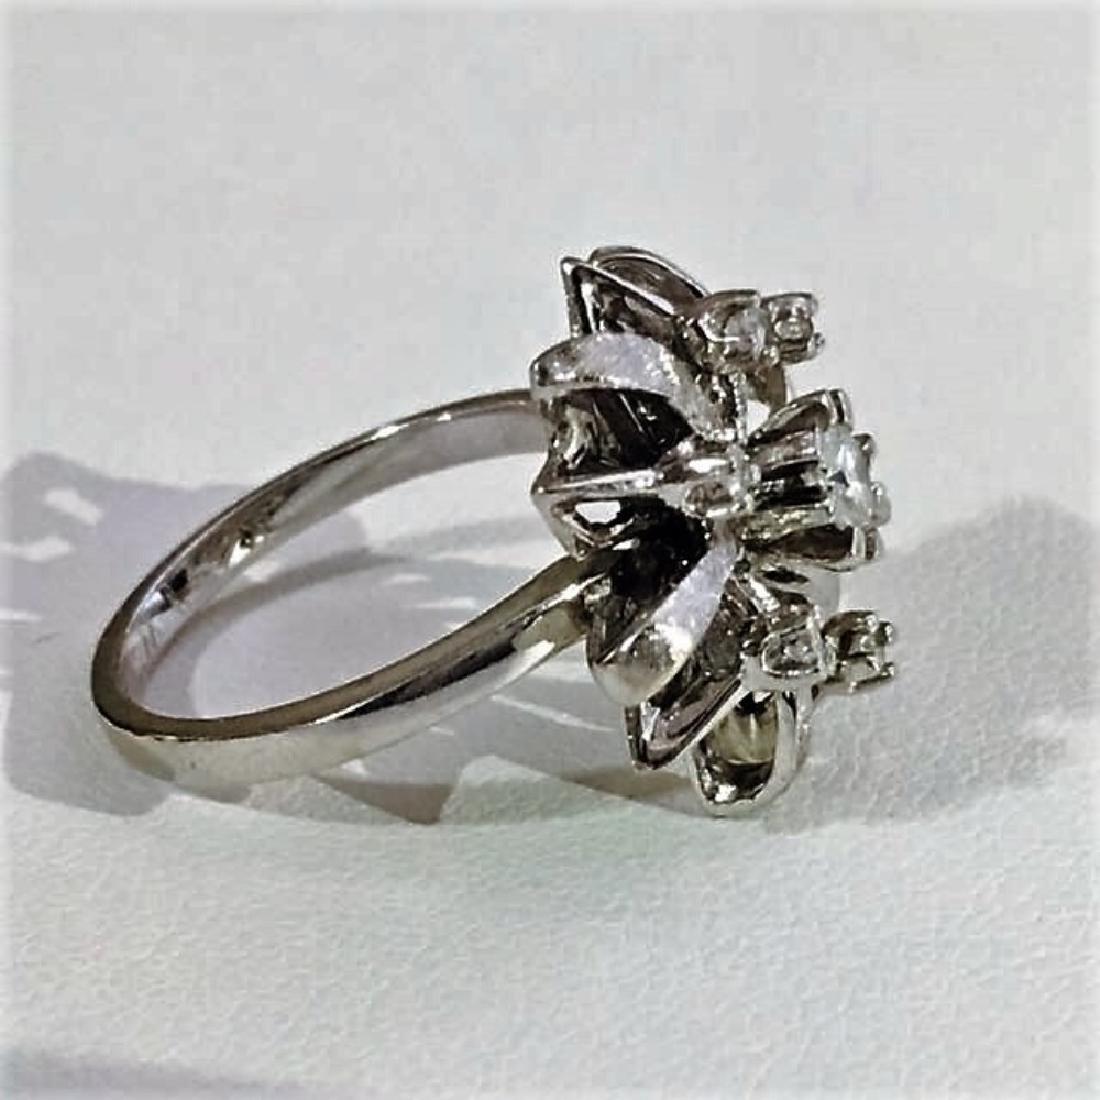 14K White Gold Cocktail Diamond Ring - 4